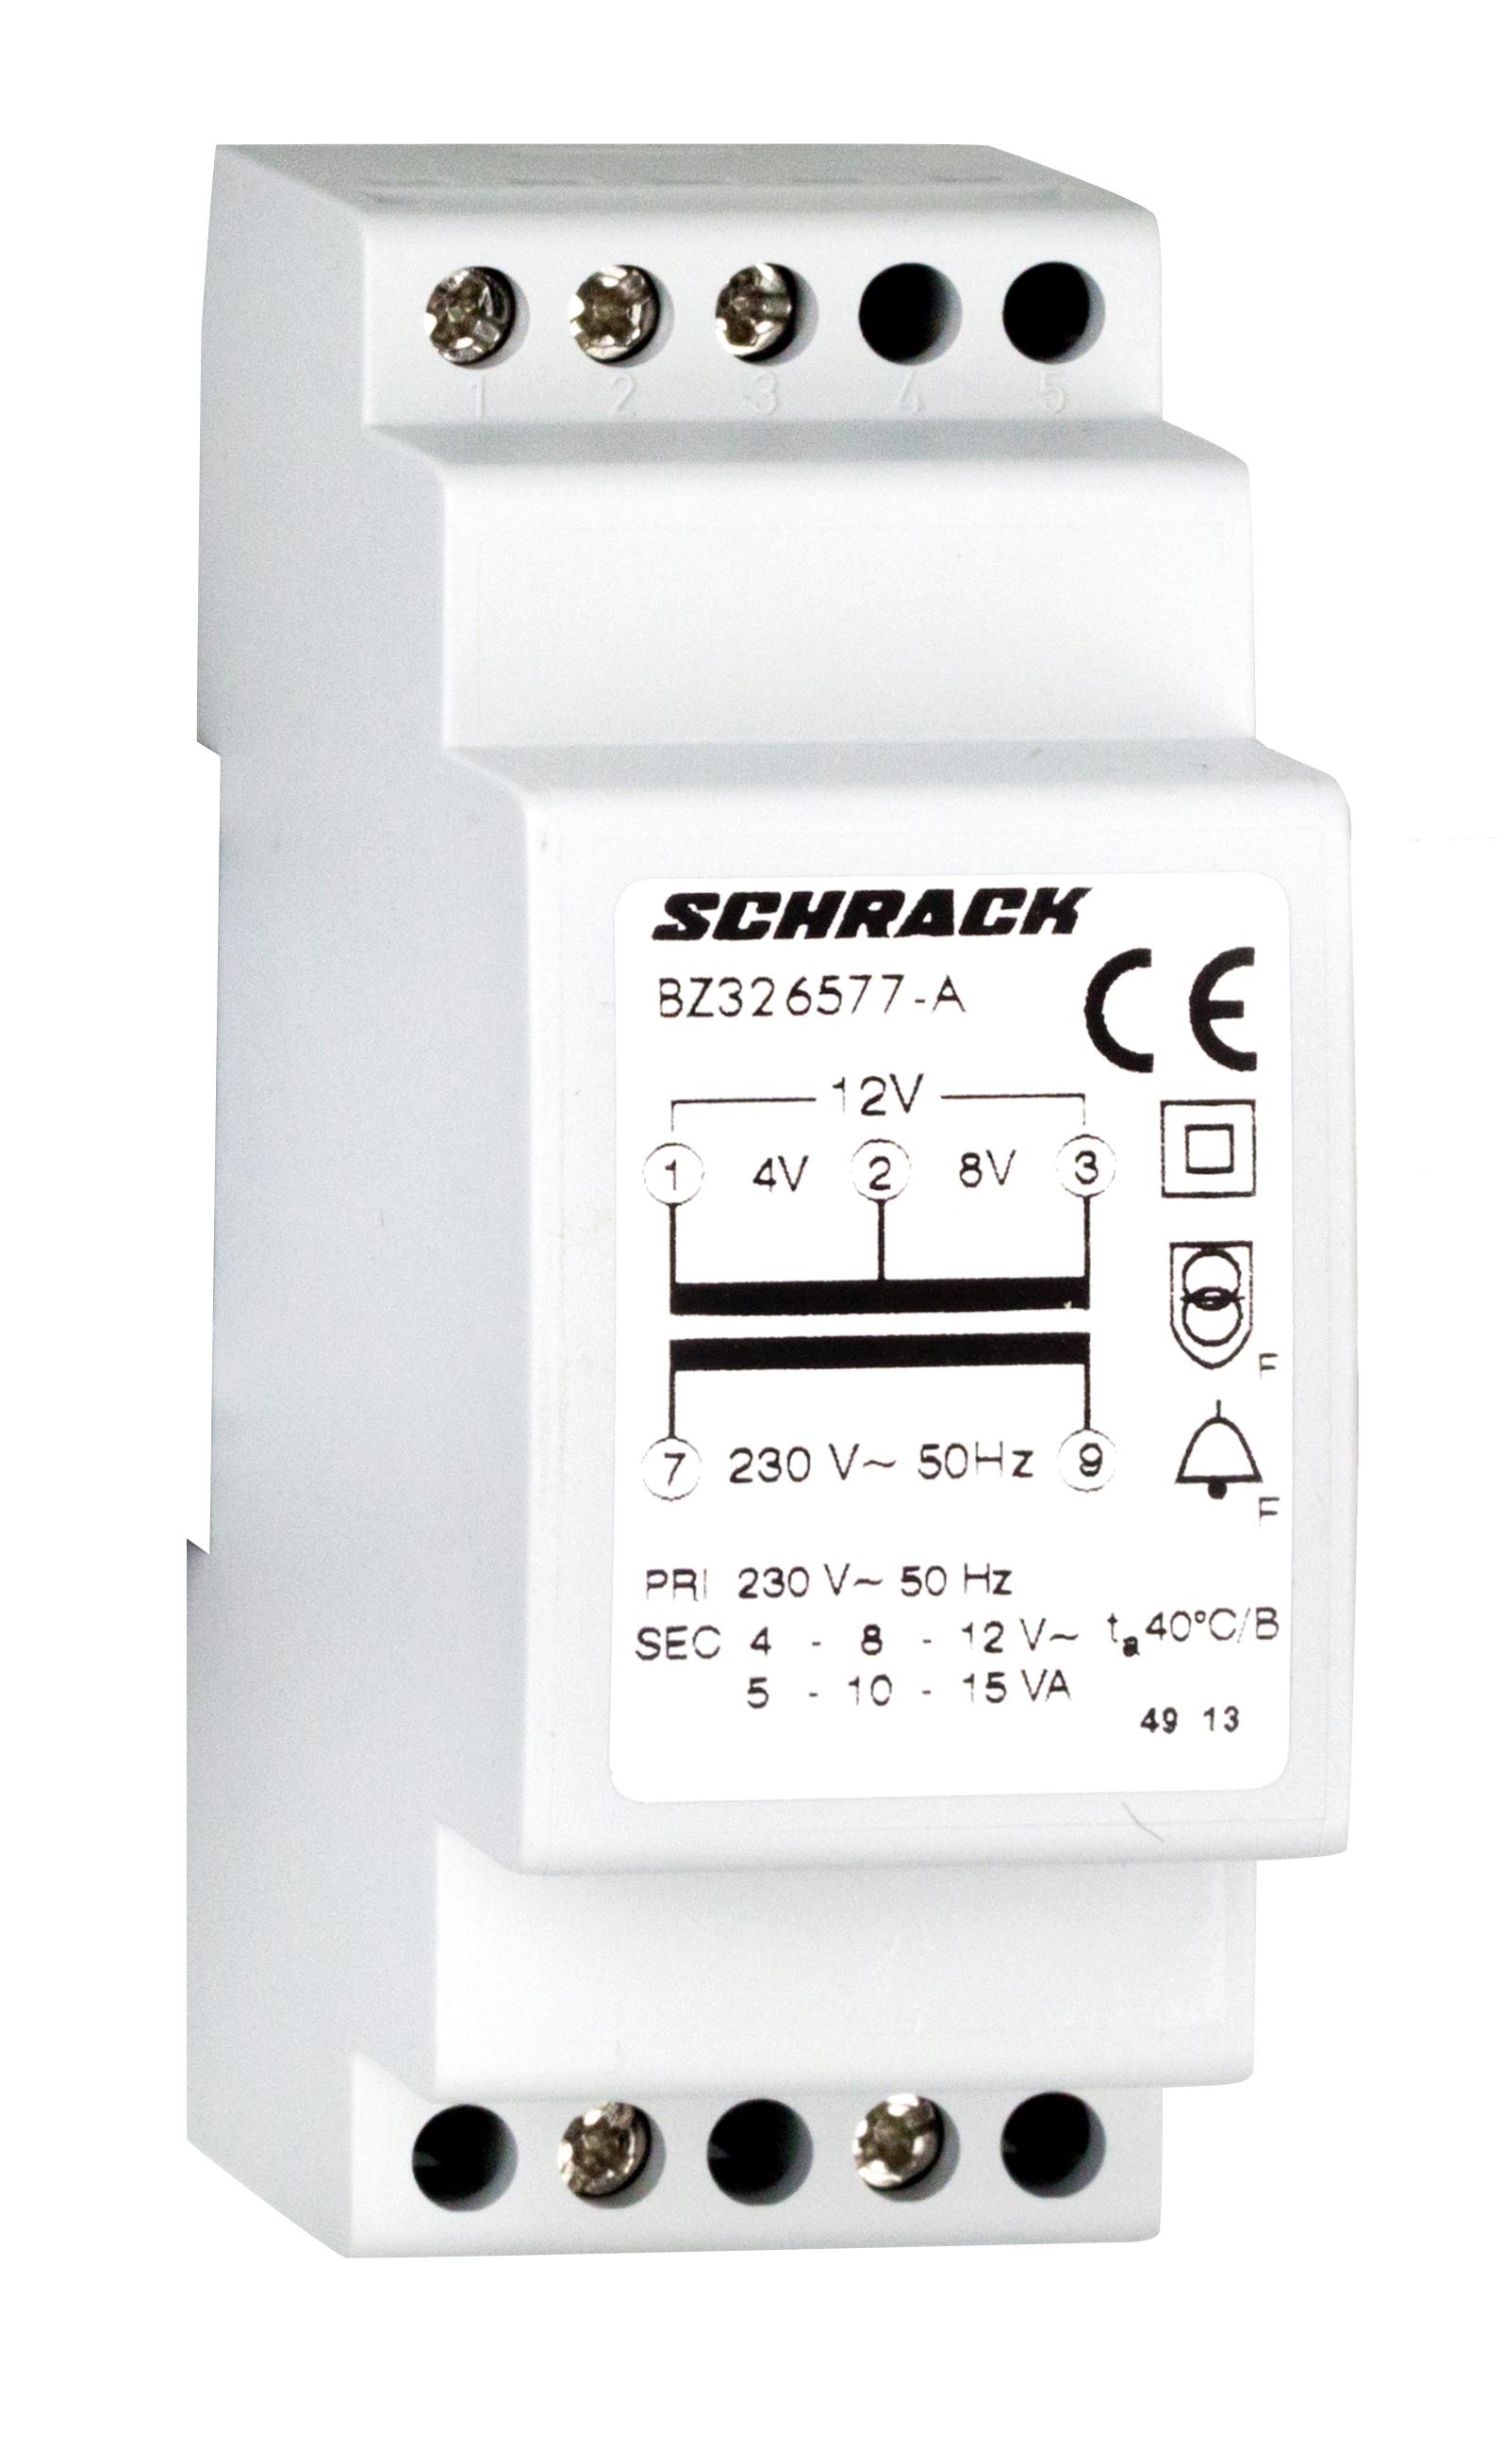 1 Stk RE-Klingeltrafo, 230VAC primär, 4/8/12VAC sekundär, 15VA BZ326577-A